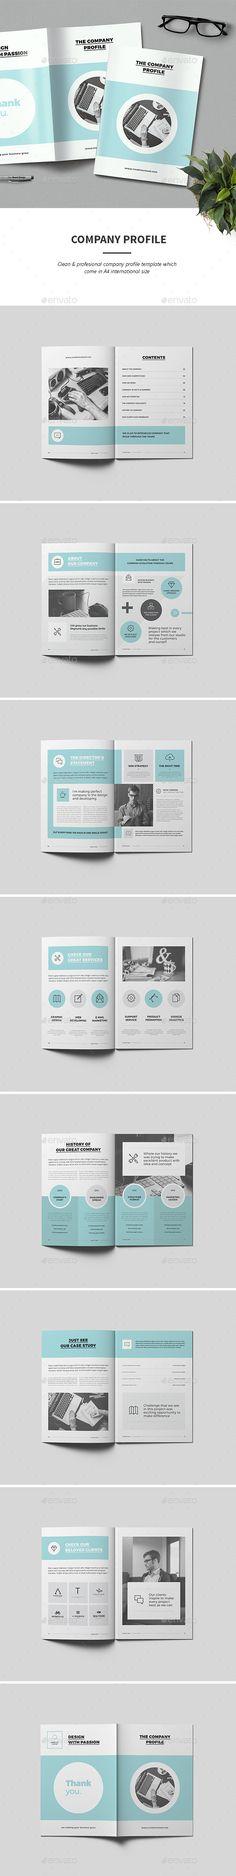 Company Profile - Corporate Brochures Download here : https://graphicriver.net/item/company-profile/18934096?s_rank=131&ref=Al-fatih